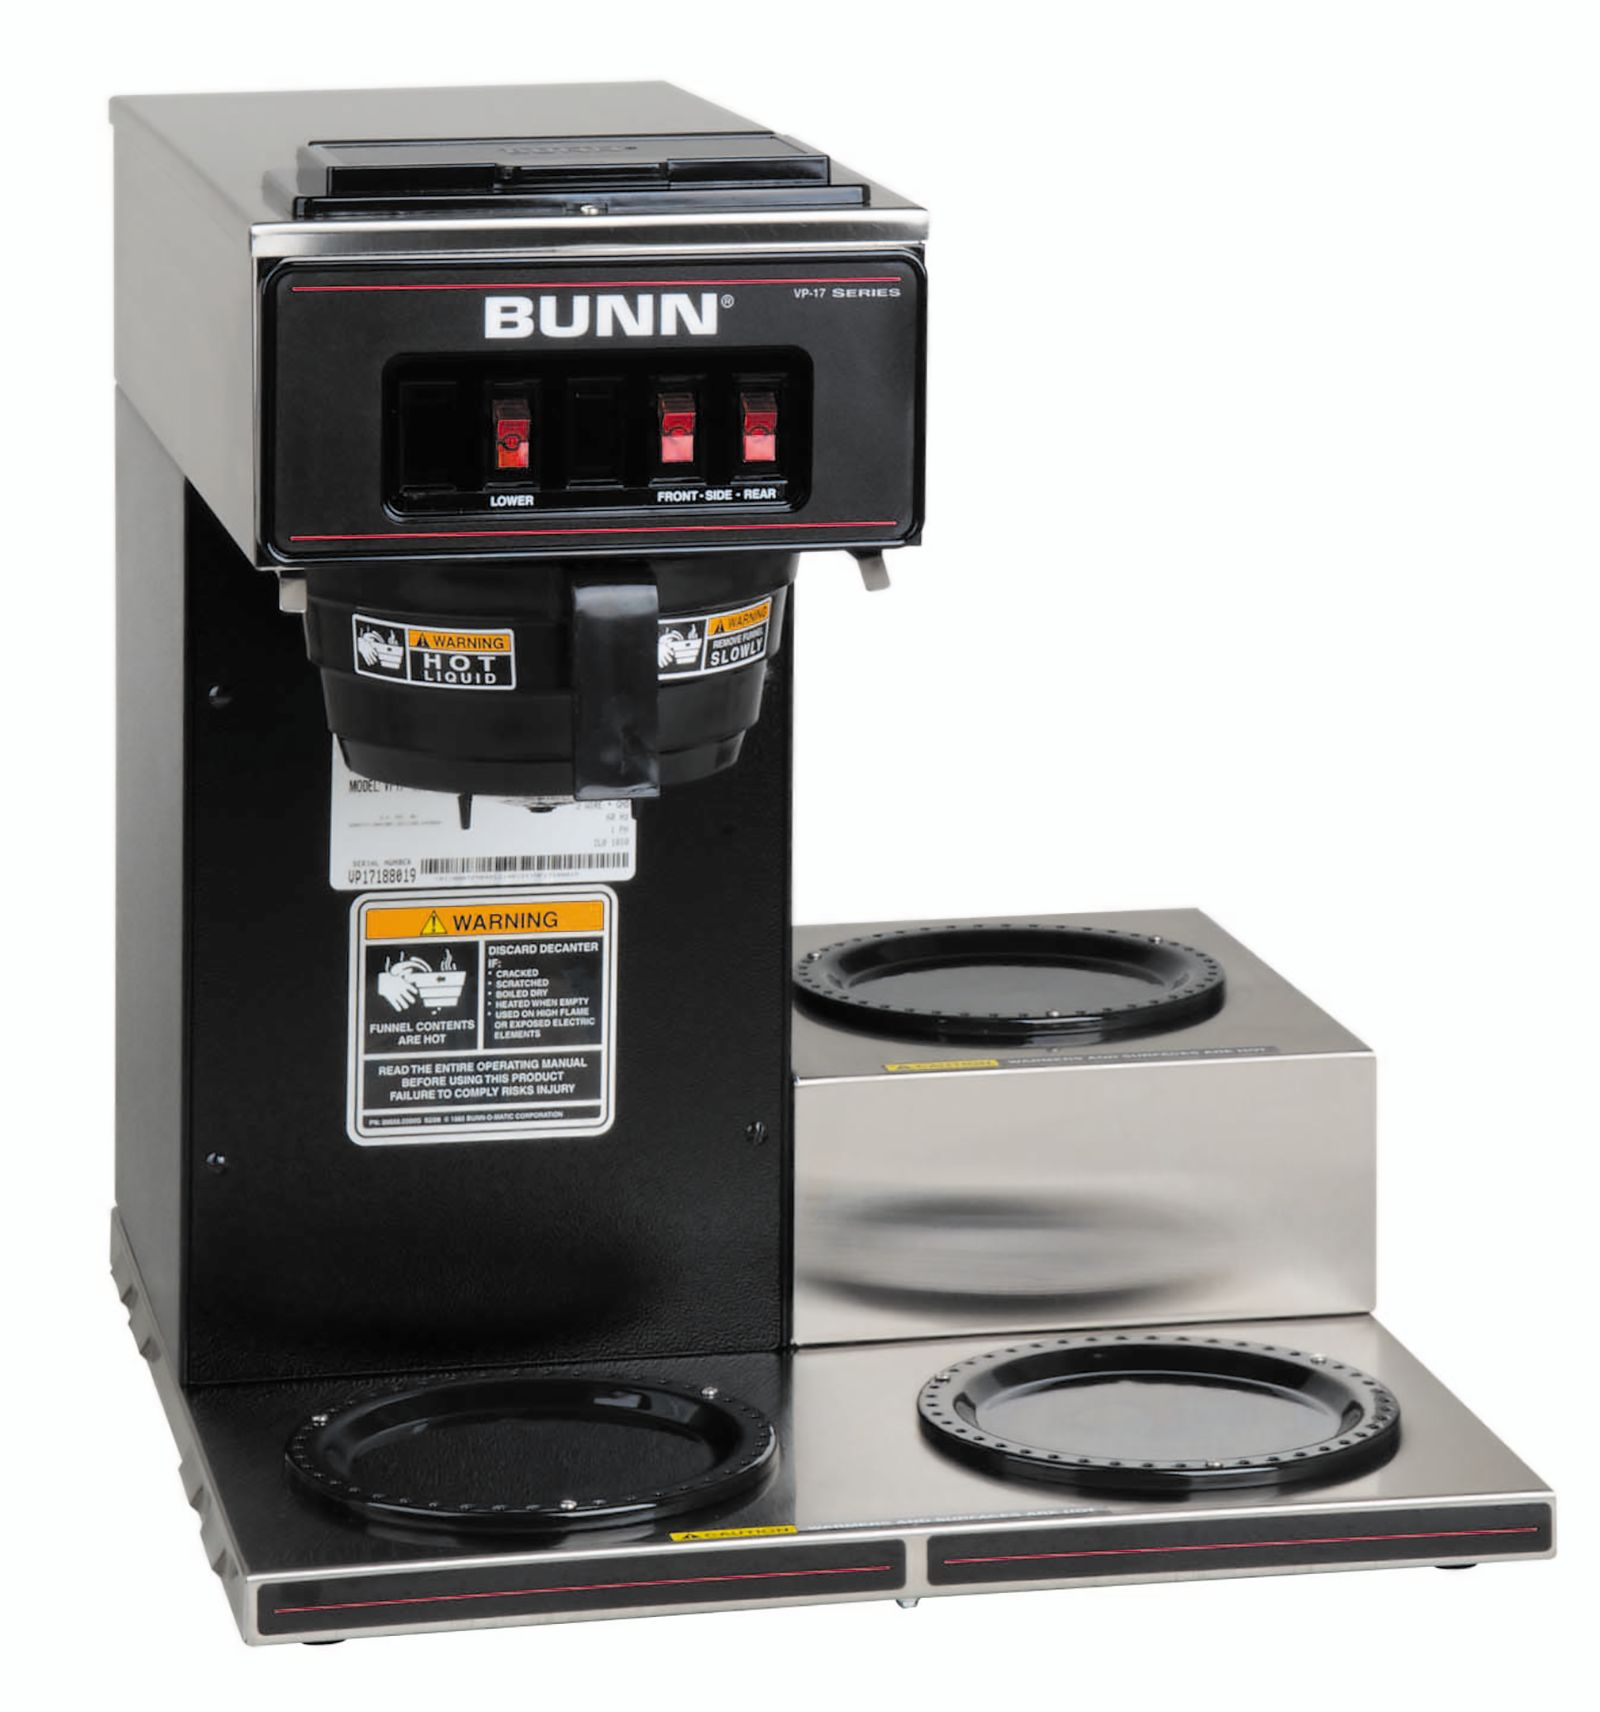 bunn coffee maker wiring diagram wiring library Bunn Coffee Maker Water Leakage